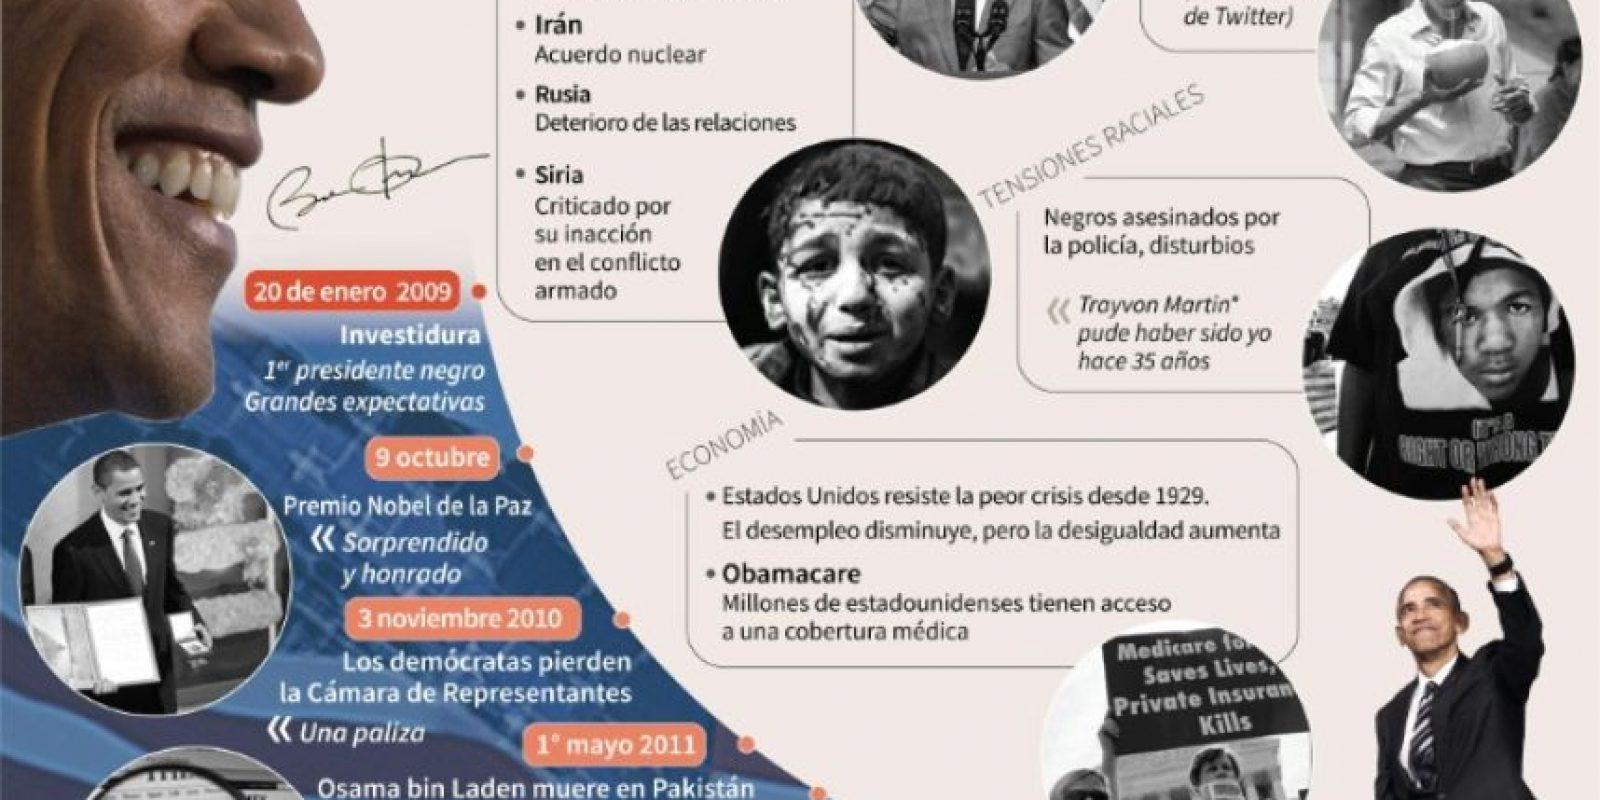 Los años de Obama Foto:Alain BOMMENEL, Valentina BRESCHI, Paz PIZARRO, Vincent LEFAI/afp.com